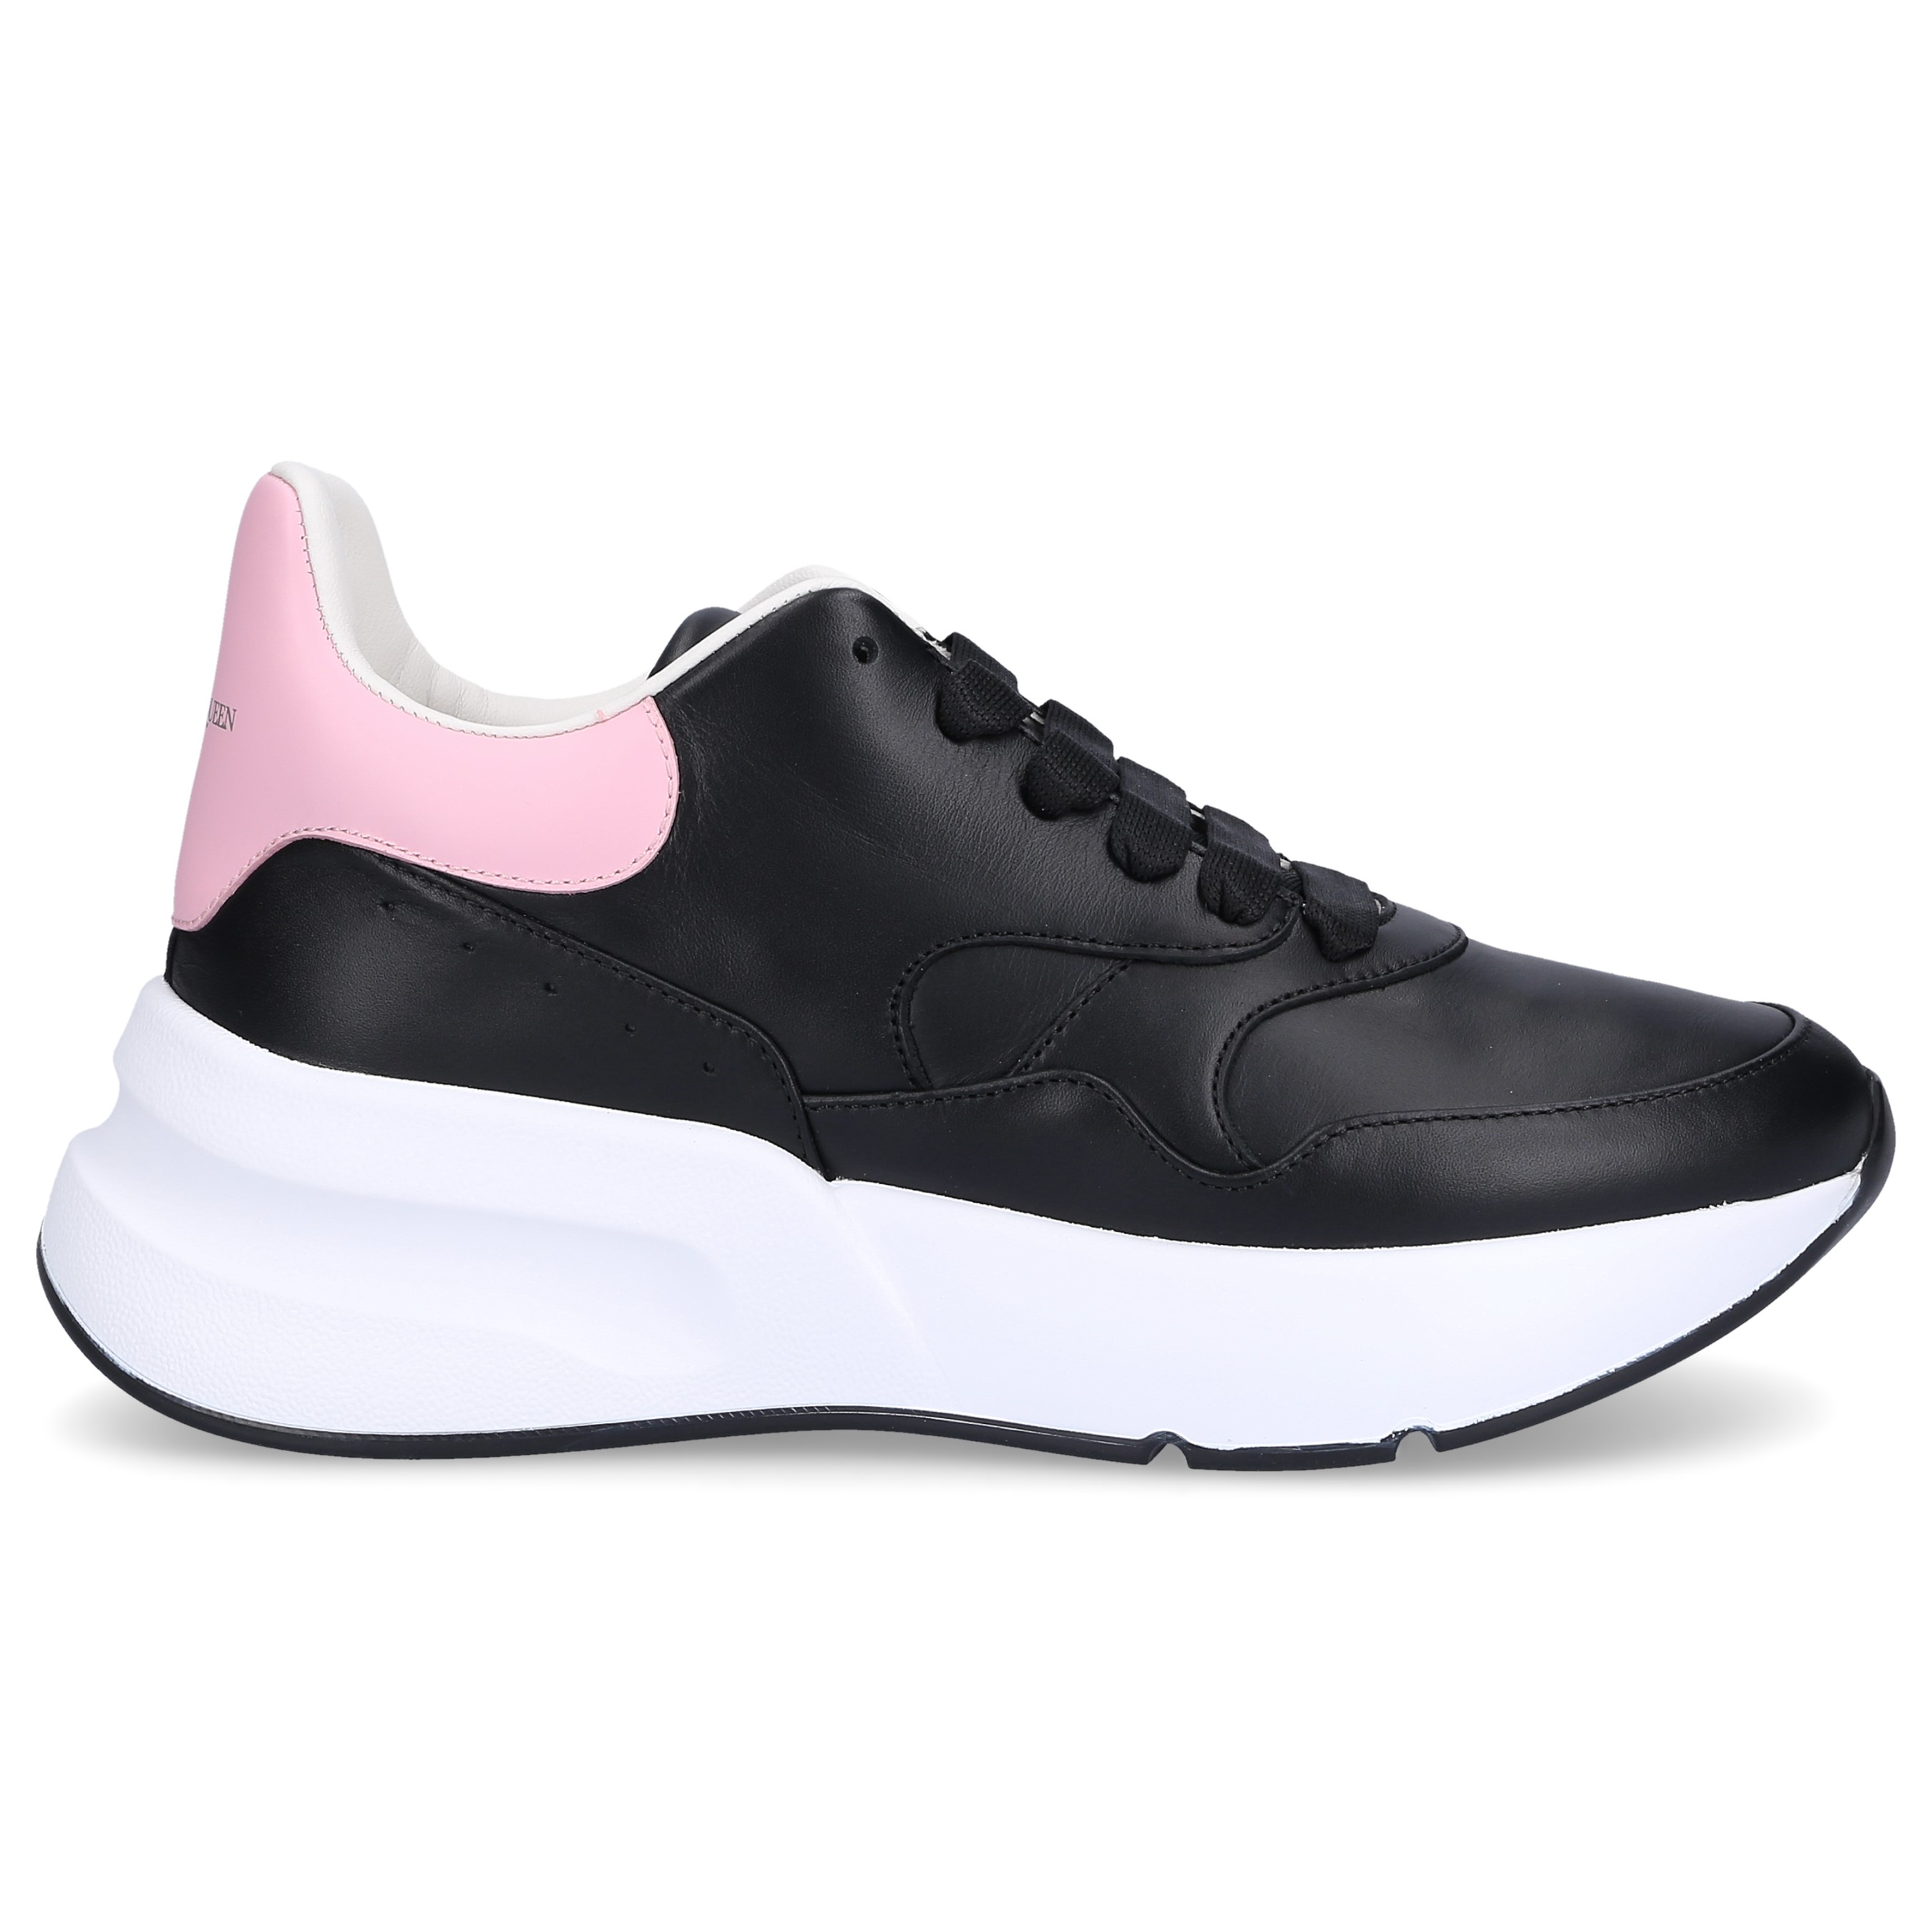 Alexander McQueen Sneaker low JOEY Nappaleder Logo rosa schwarz